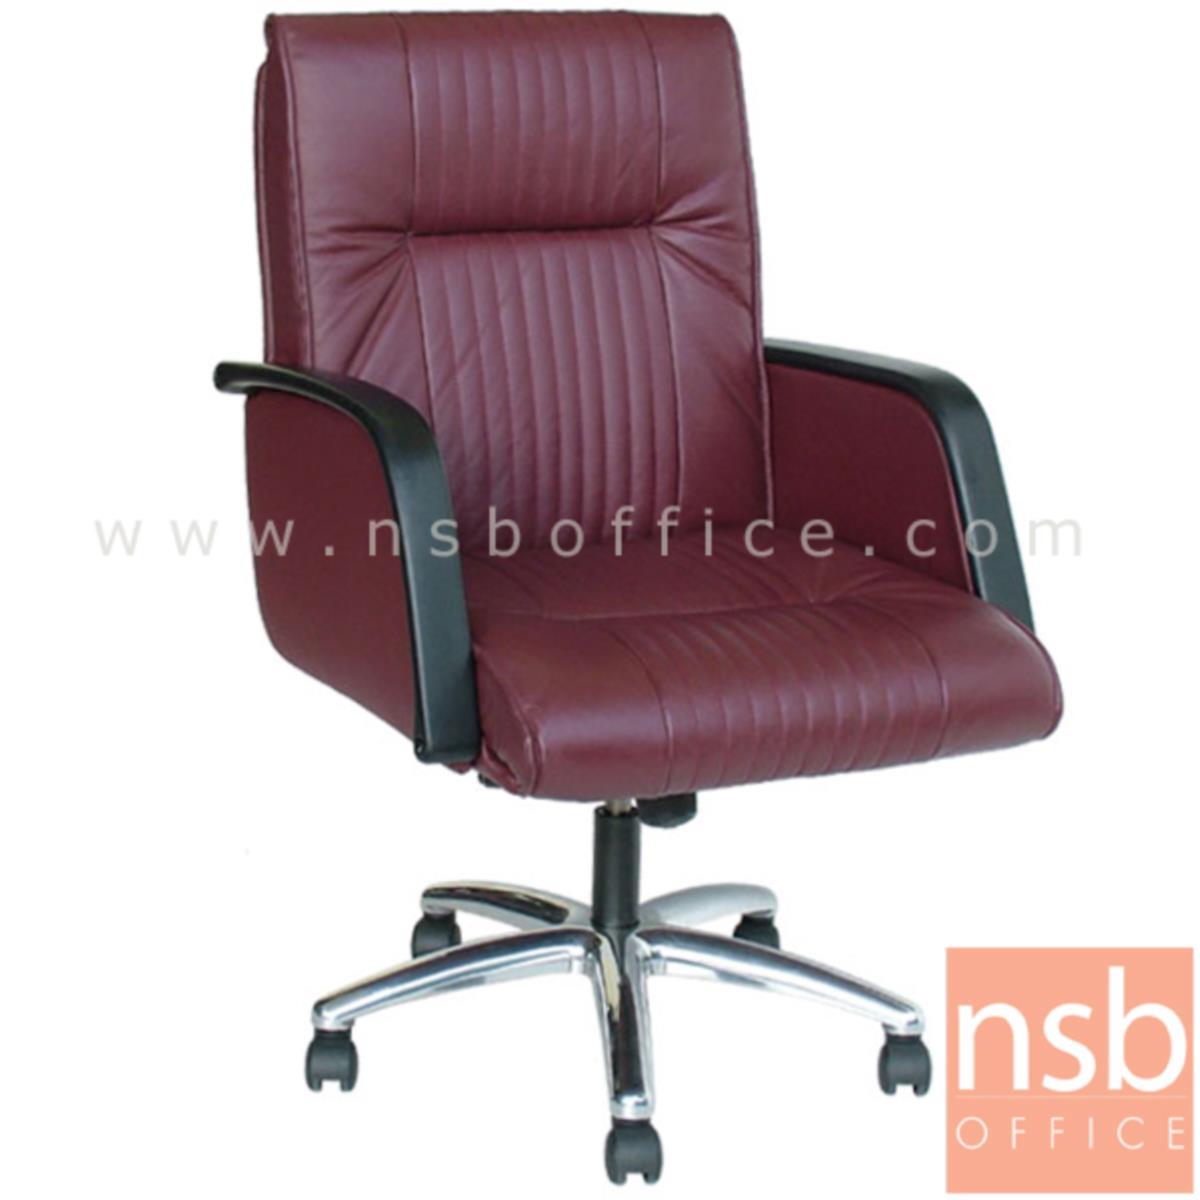 B03A264:เก้าอี้สำนักงาน รุ่น Perceval (เพอร์ซิวัล)  โช๊คแก๊ส มีก้อนโยก ขาเหล็กชุบโครเมี่ยม